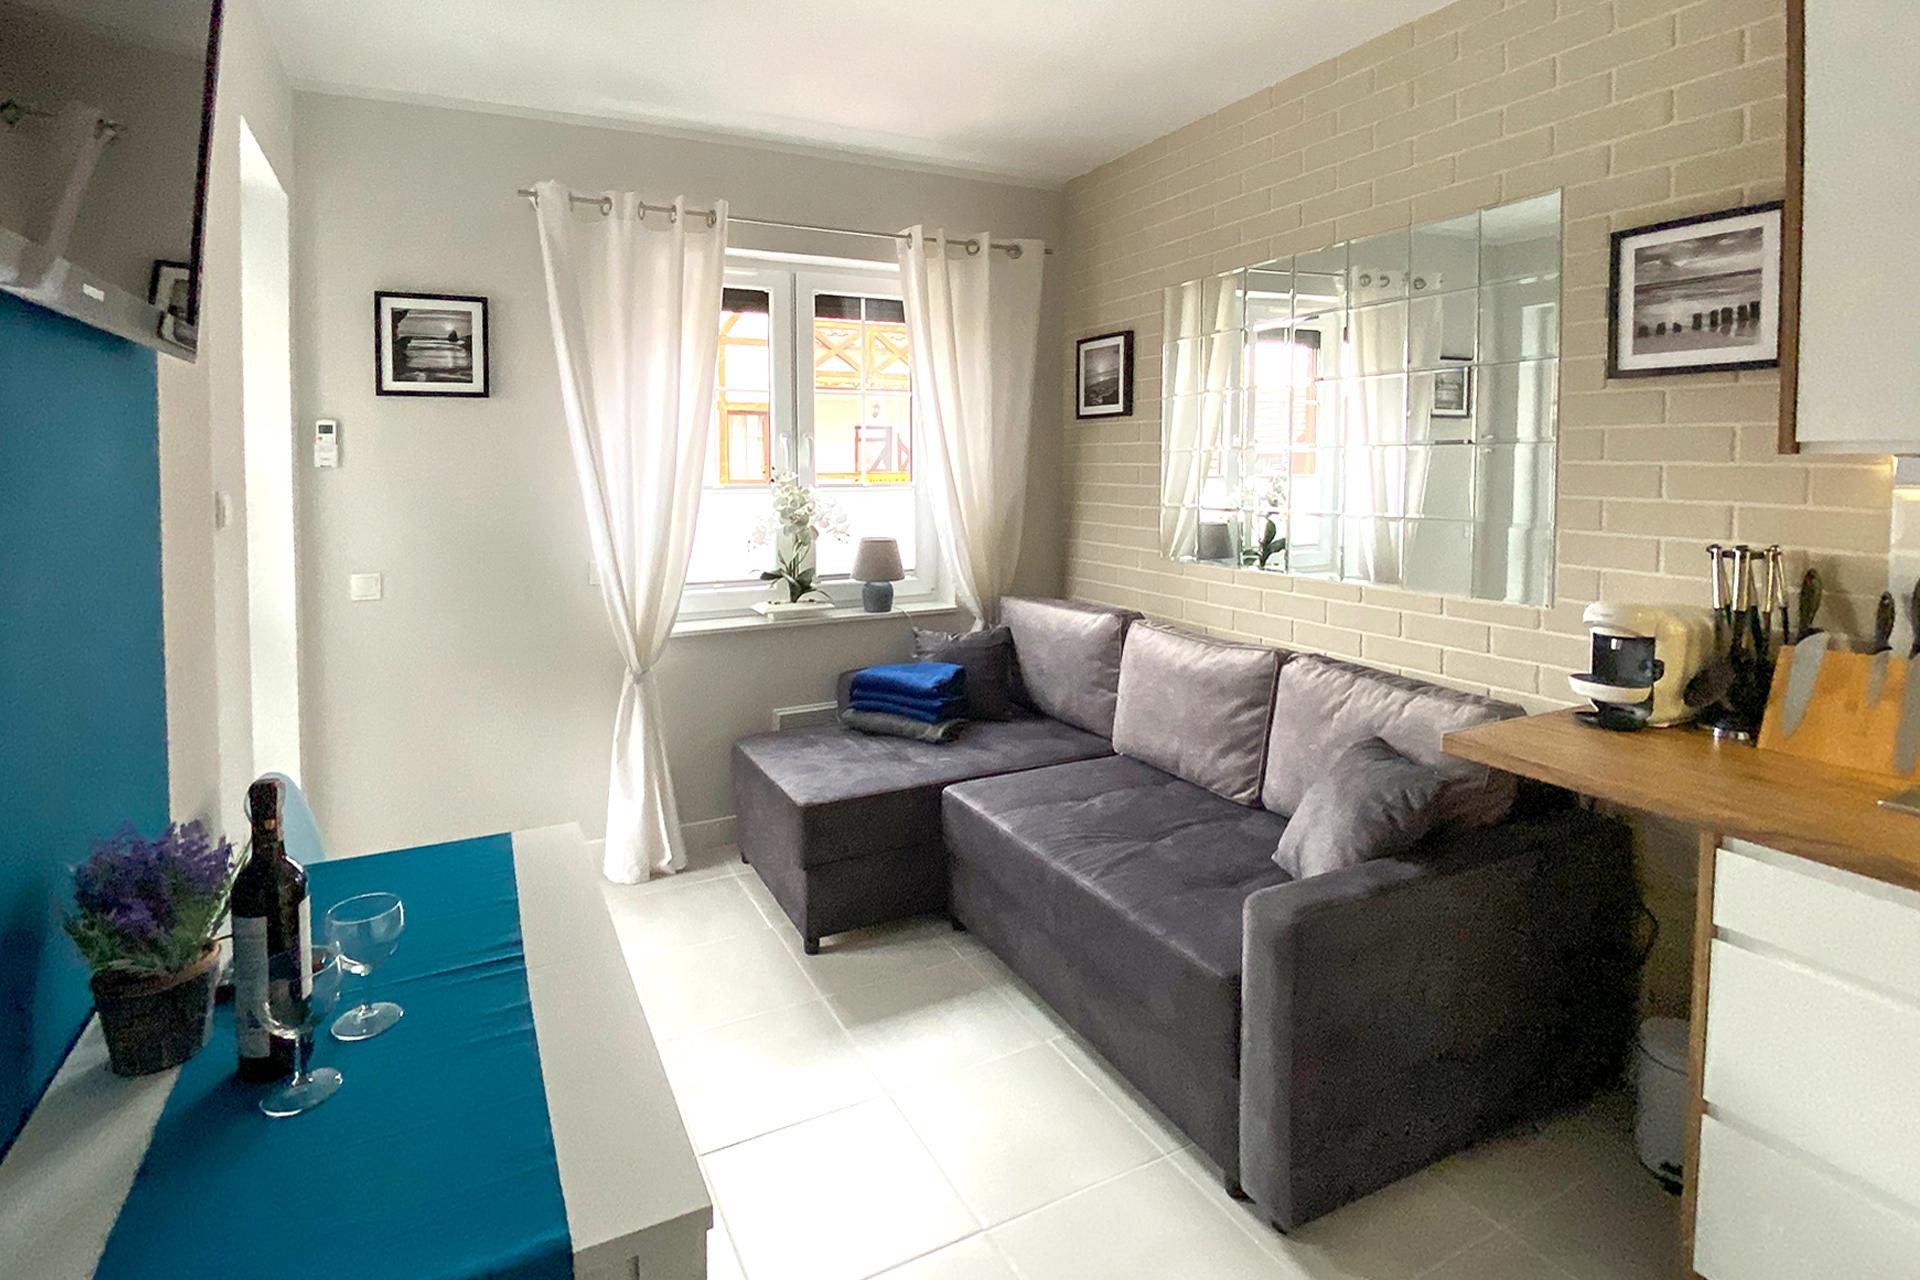 Apartament Wschodni